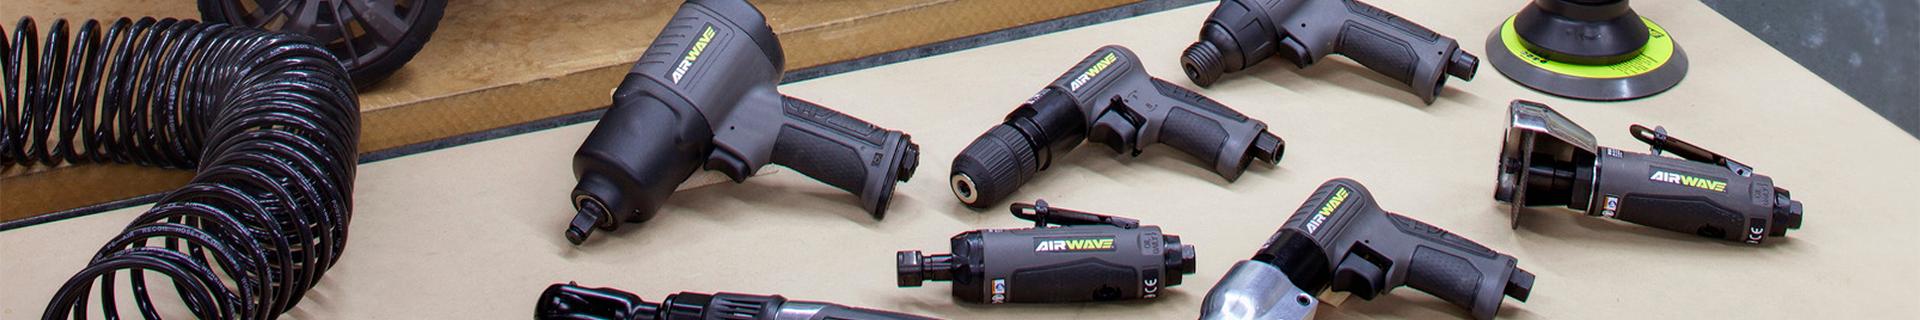 Ryobi Airwave tools on ground.